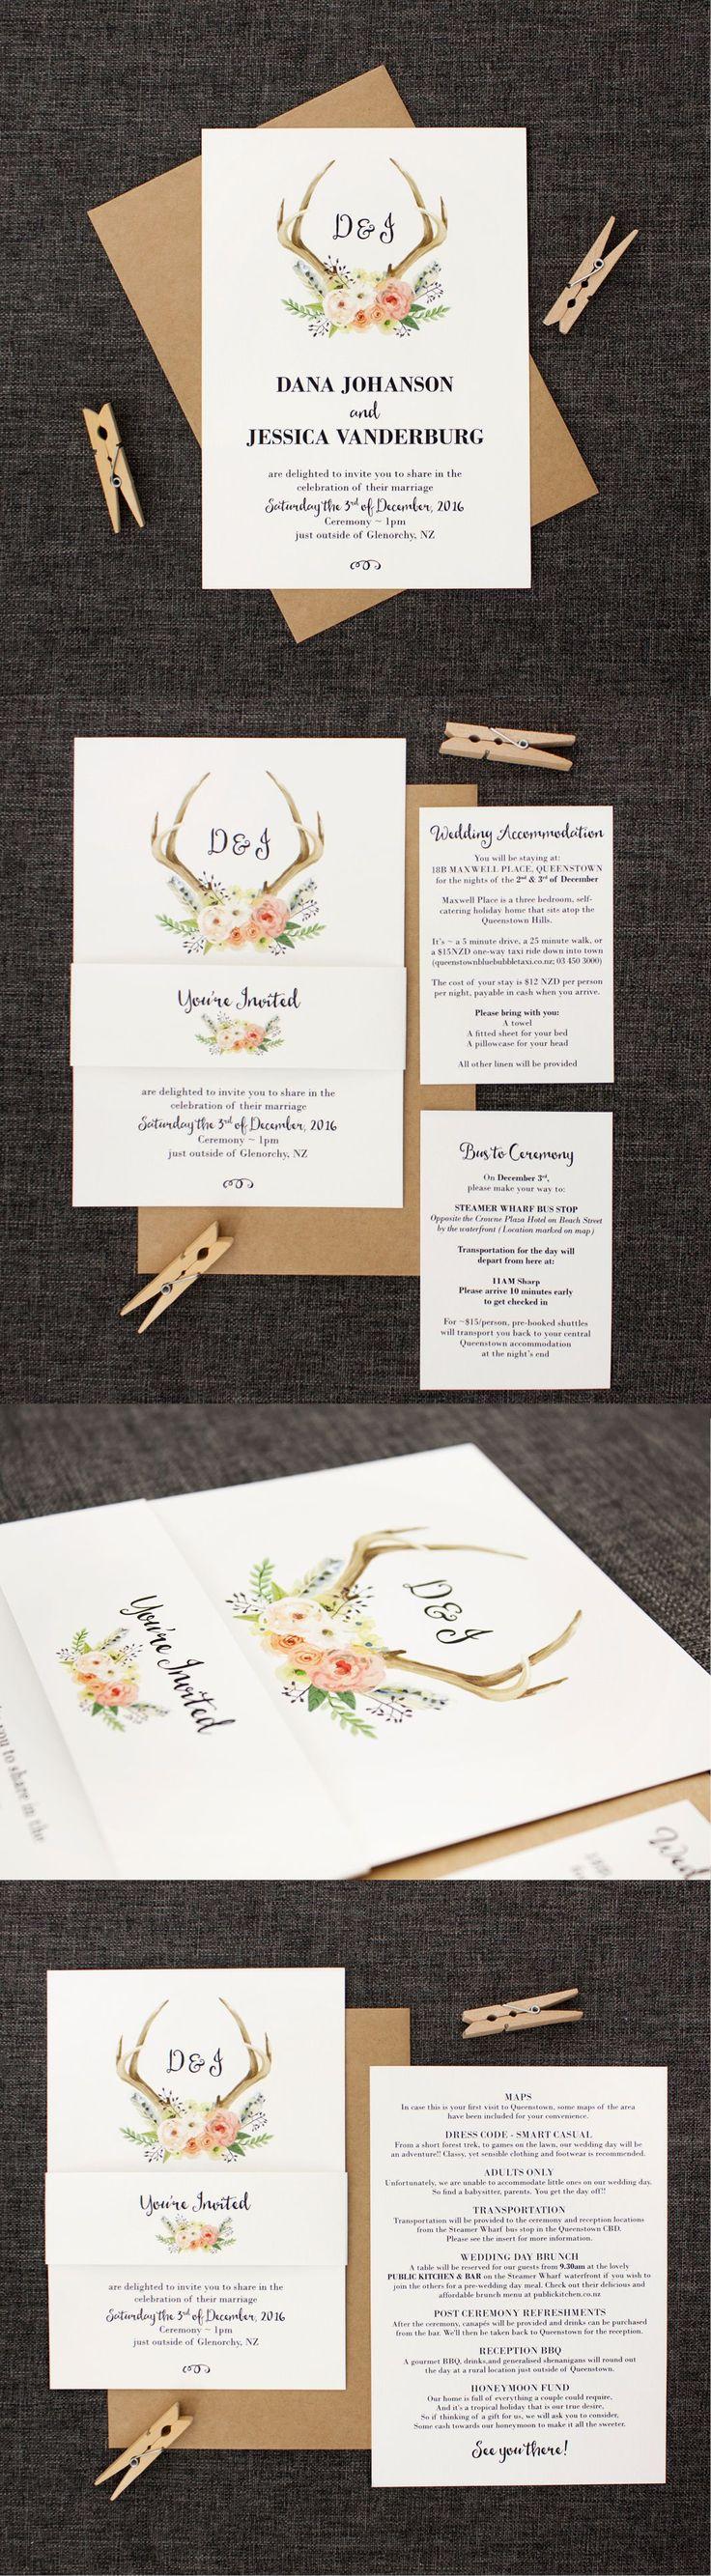 deer hunter wedding invitations%0A Watercolour Deer Antlers and Flowers Wedding Invitation for a rustic  country wedding  weddinginvitation